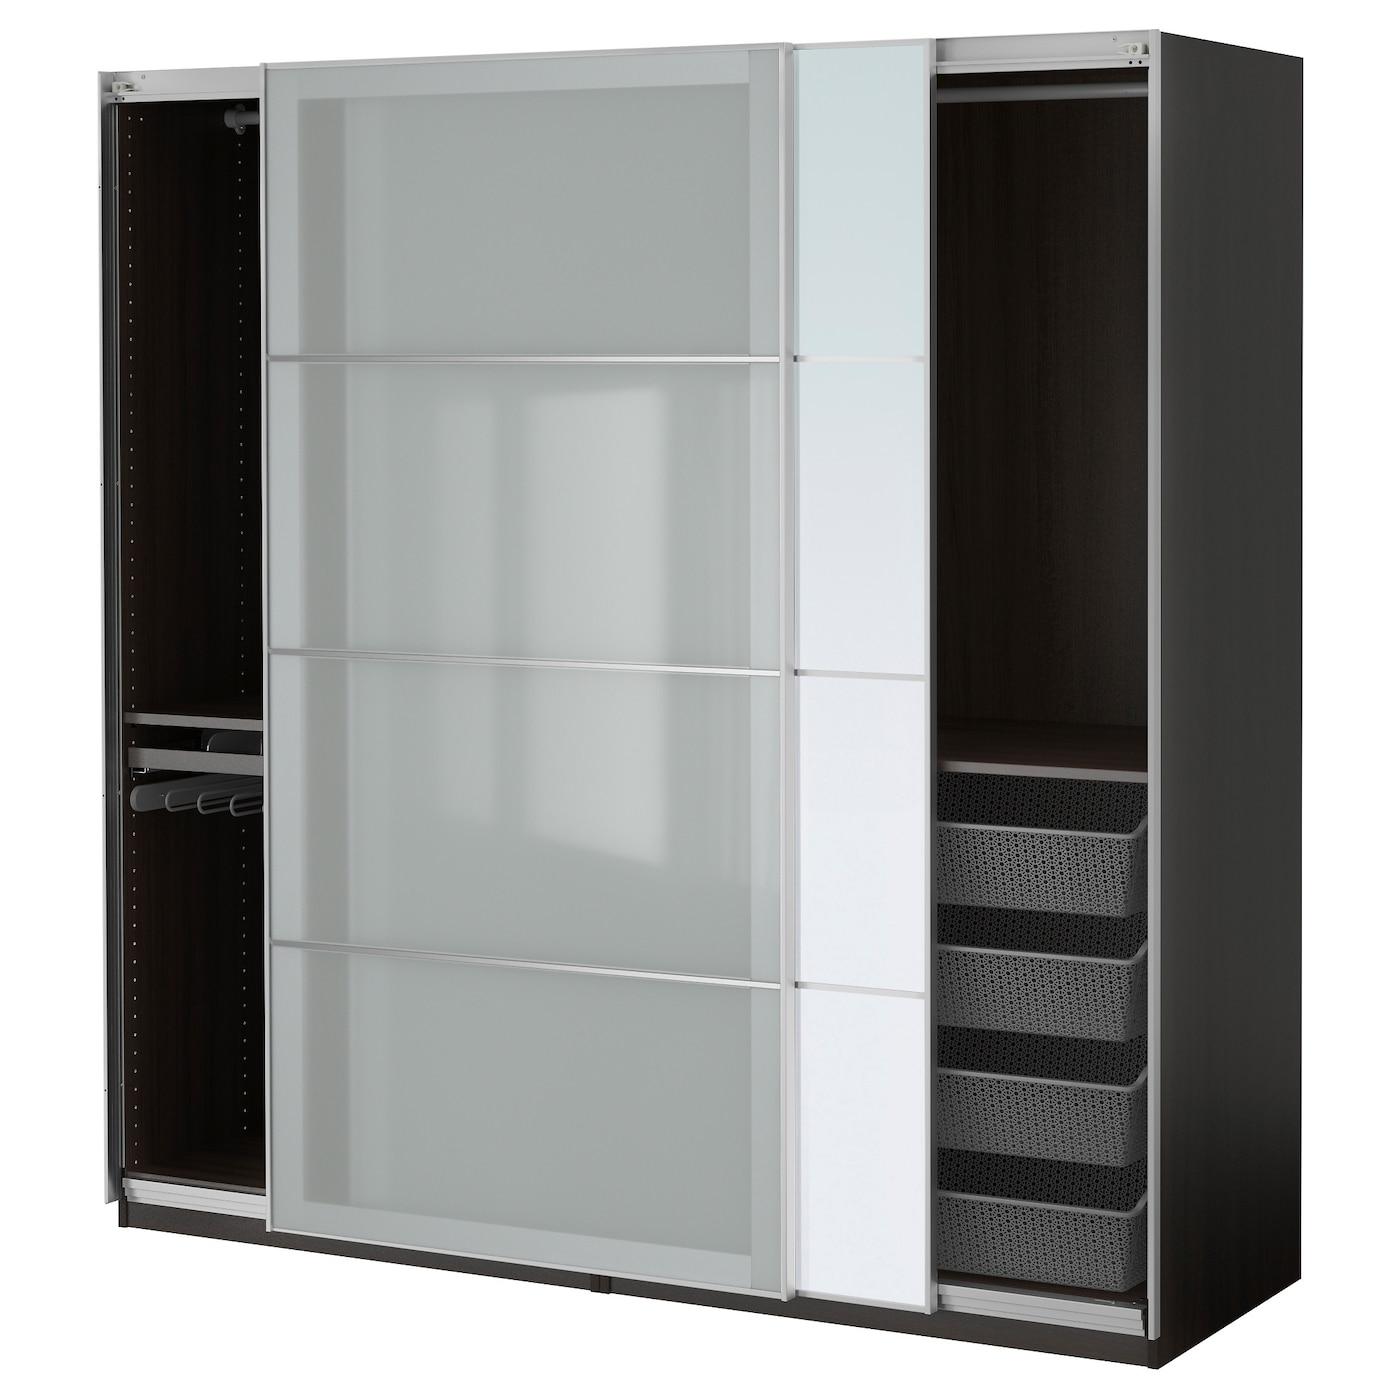 pax wardrobe black brown auli sekken 200x66x201 cm ikea. Black Bedroom Furniture Sets. Home Design Ideas